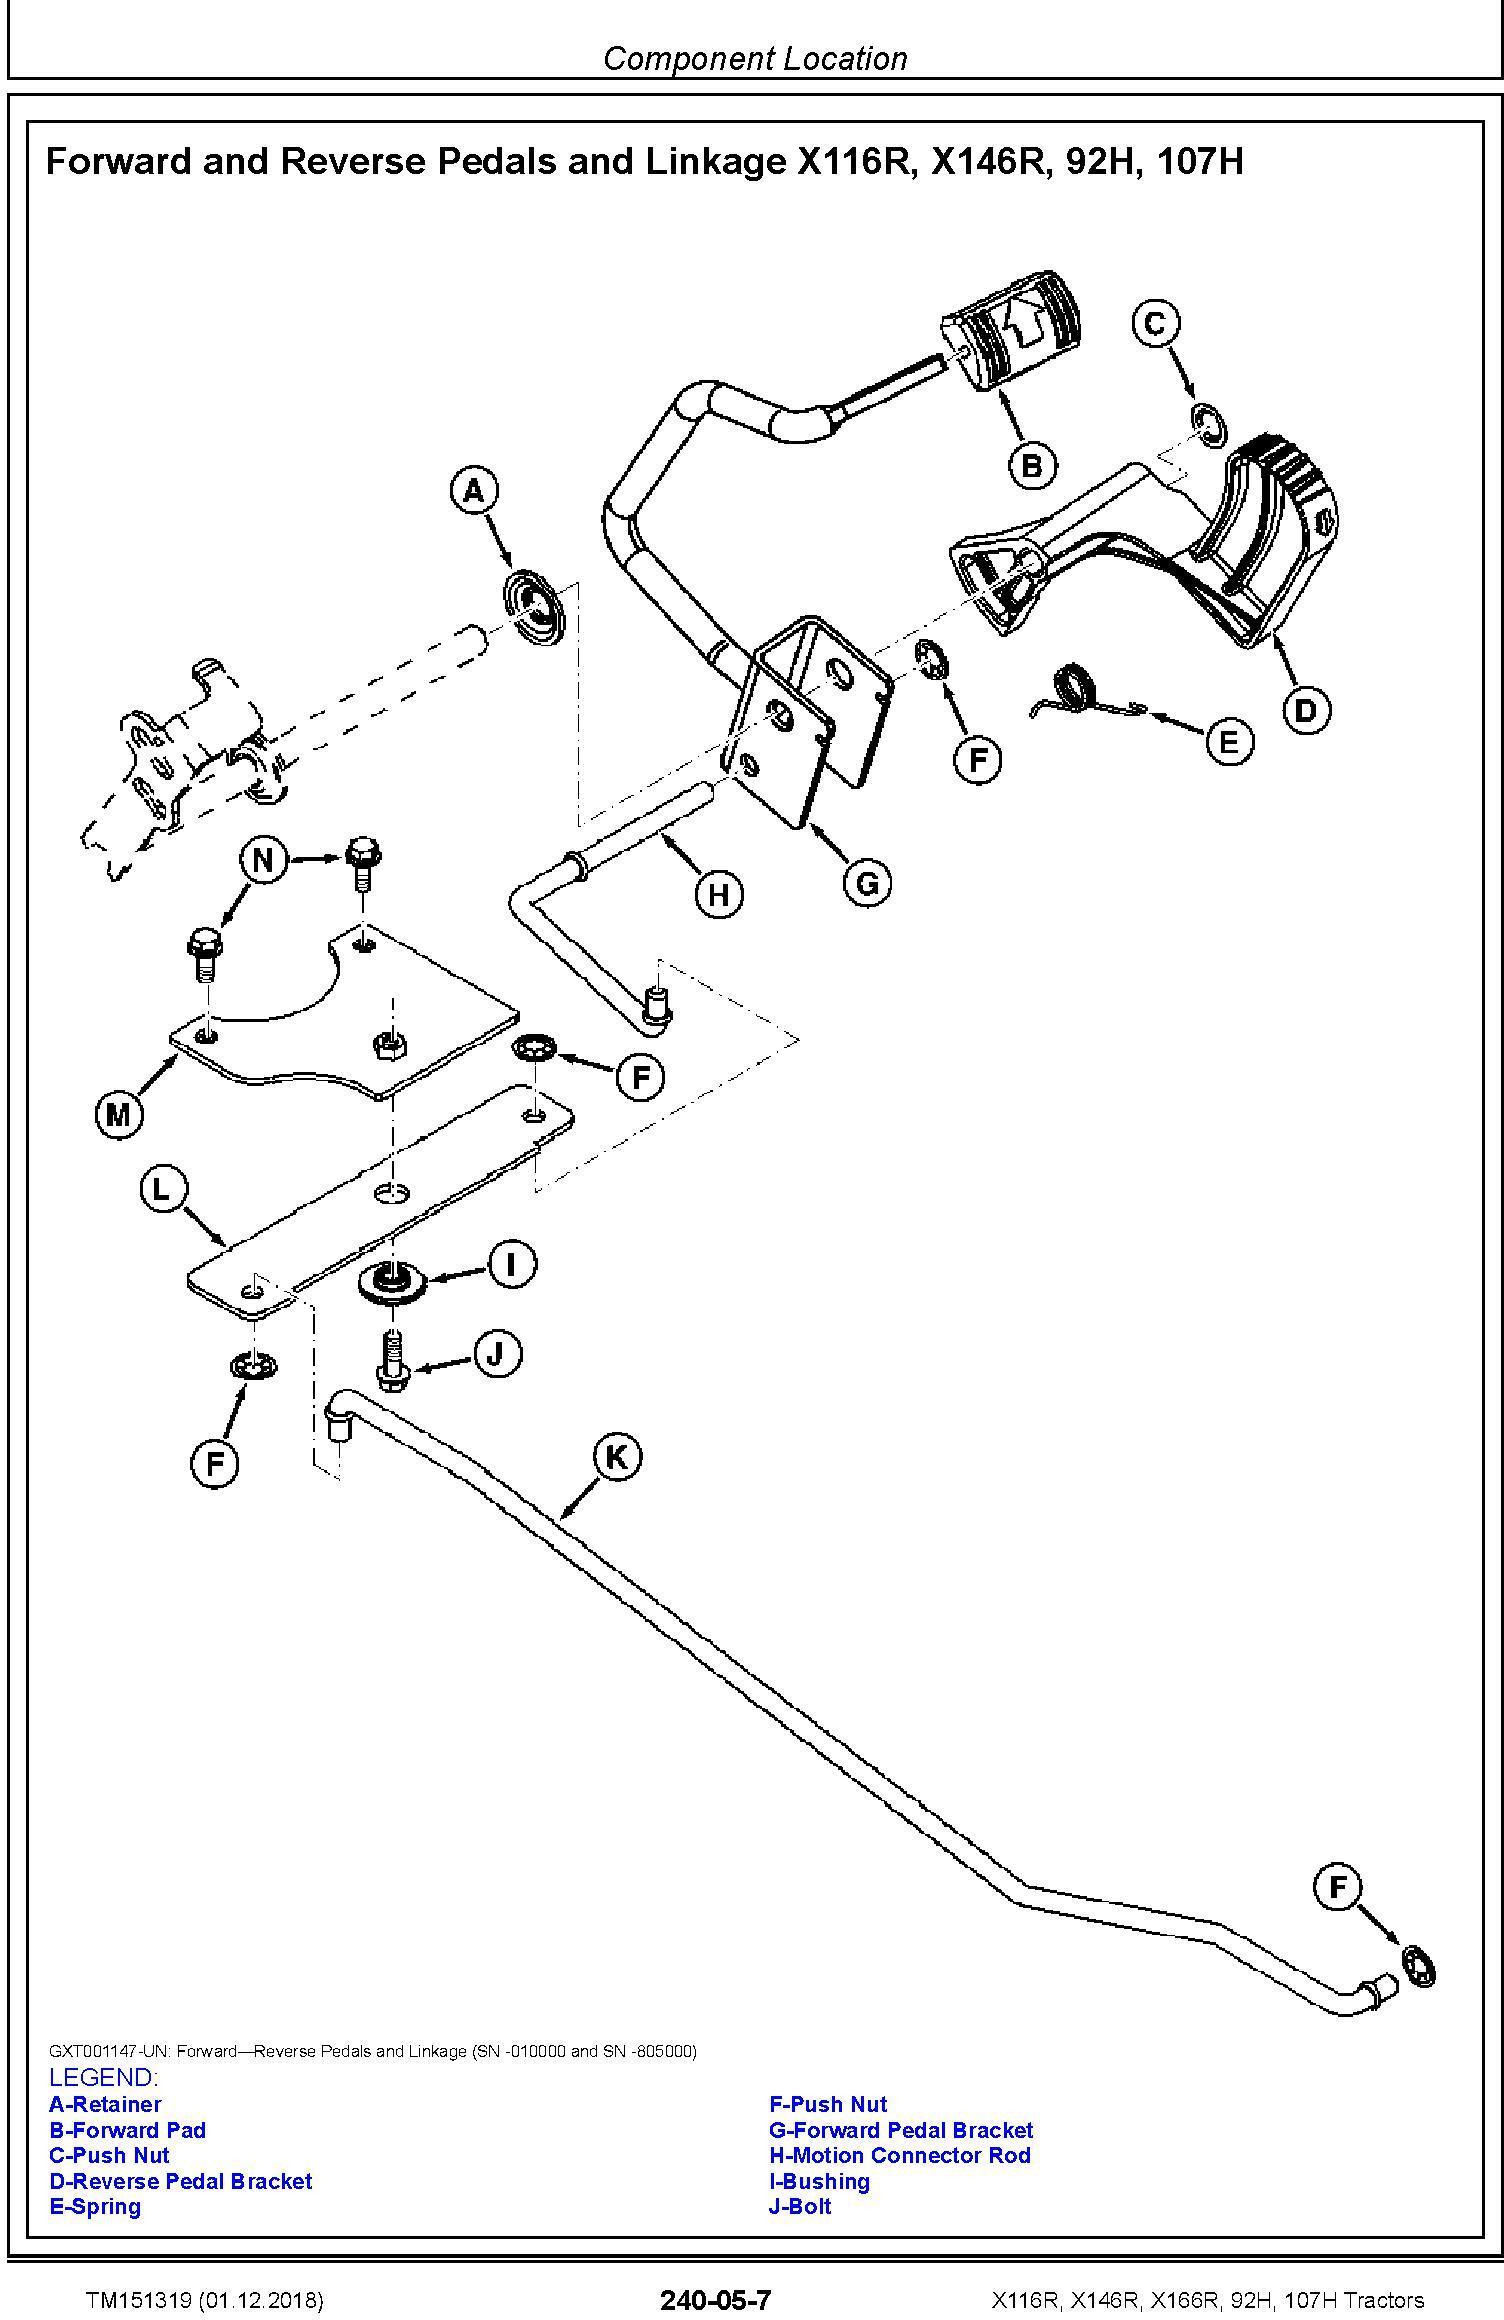 John Deere X116R, X146R, X166R, 92H, 107H Tractors (SN. 010001-) Technical Service Manual (TM151319) - 2